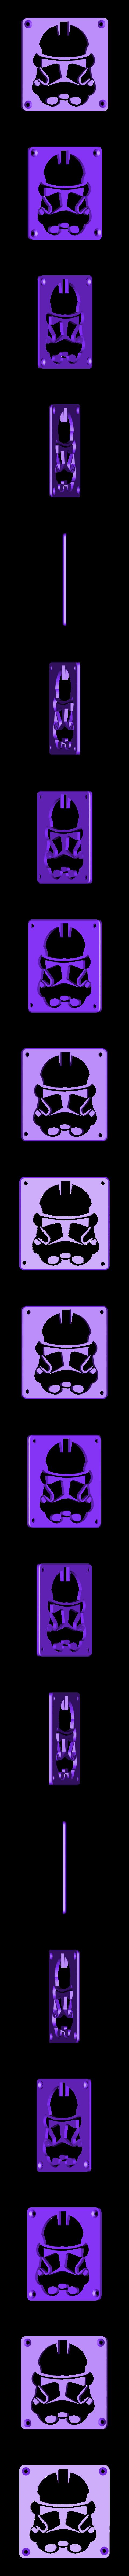 StormTrooper_Plate.STL Download free STL file StormTrooper LED Light/Nightlight • 3D print template, Balkhagal4D